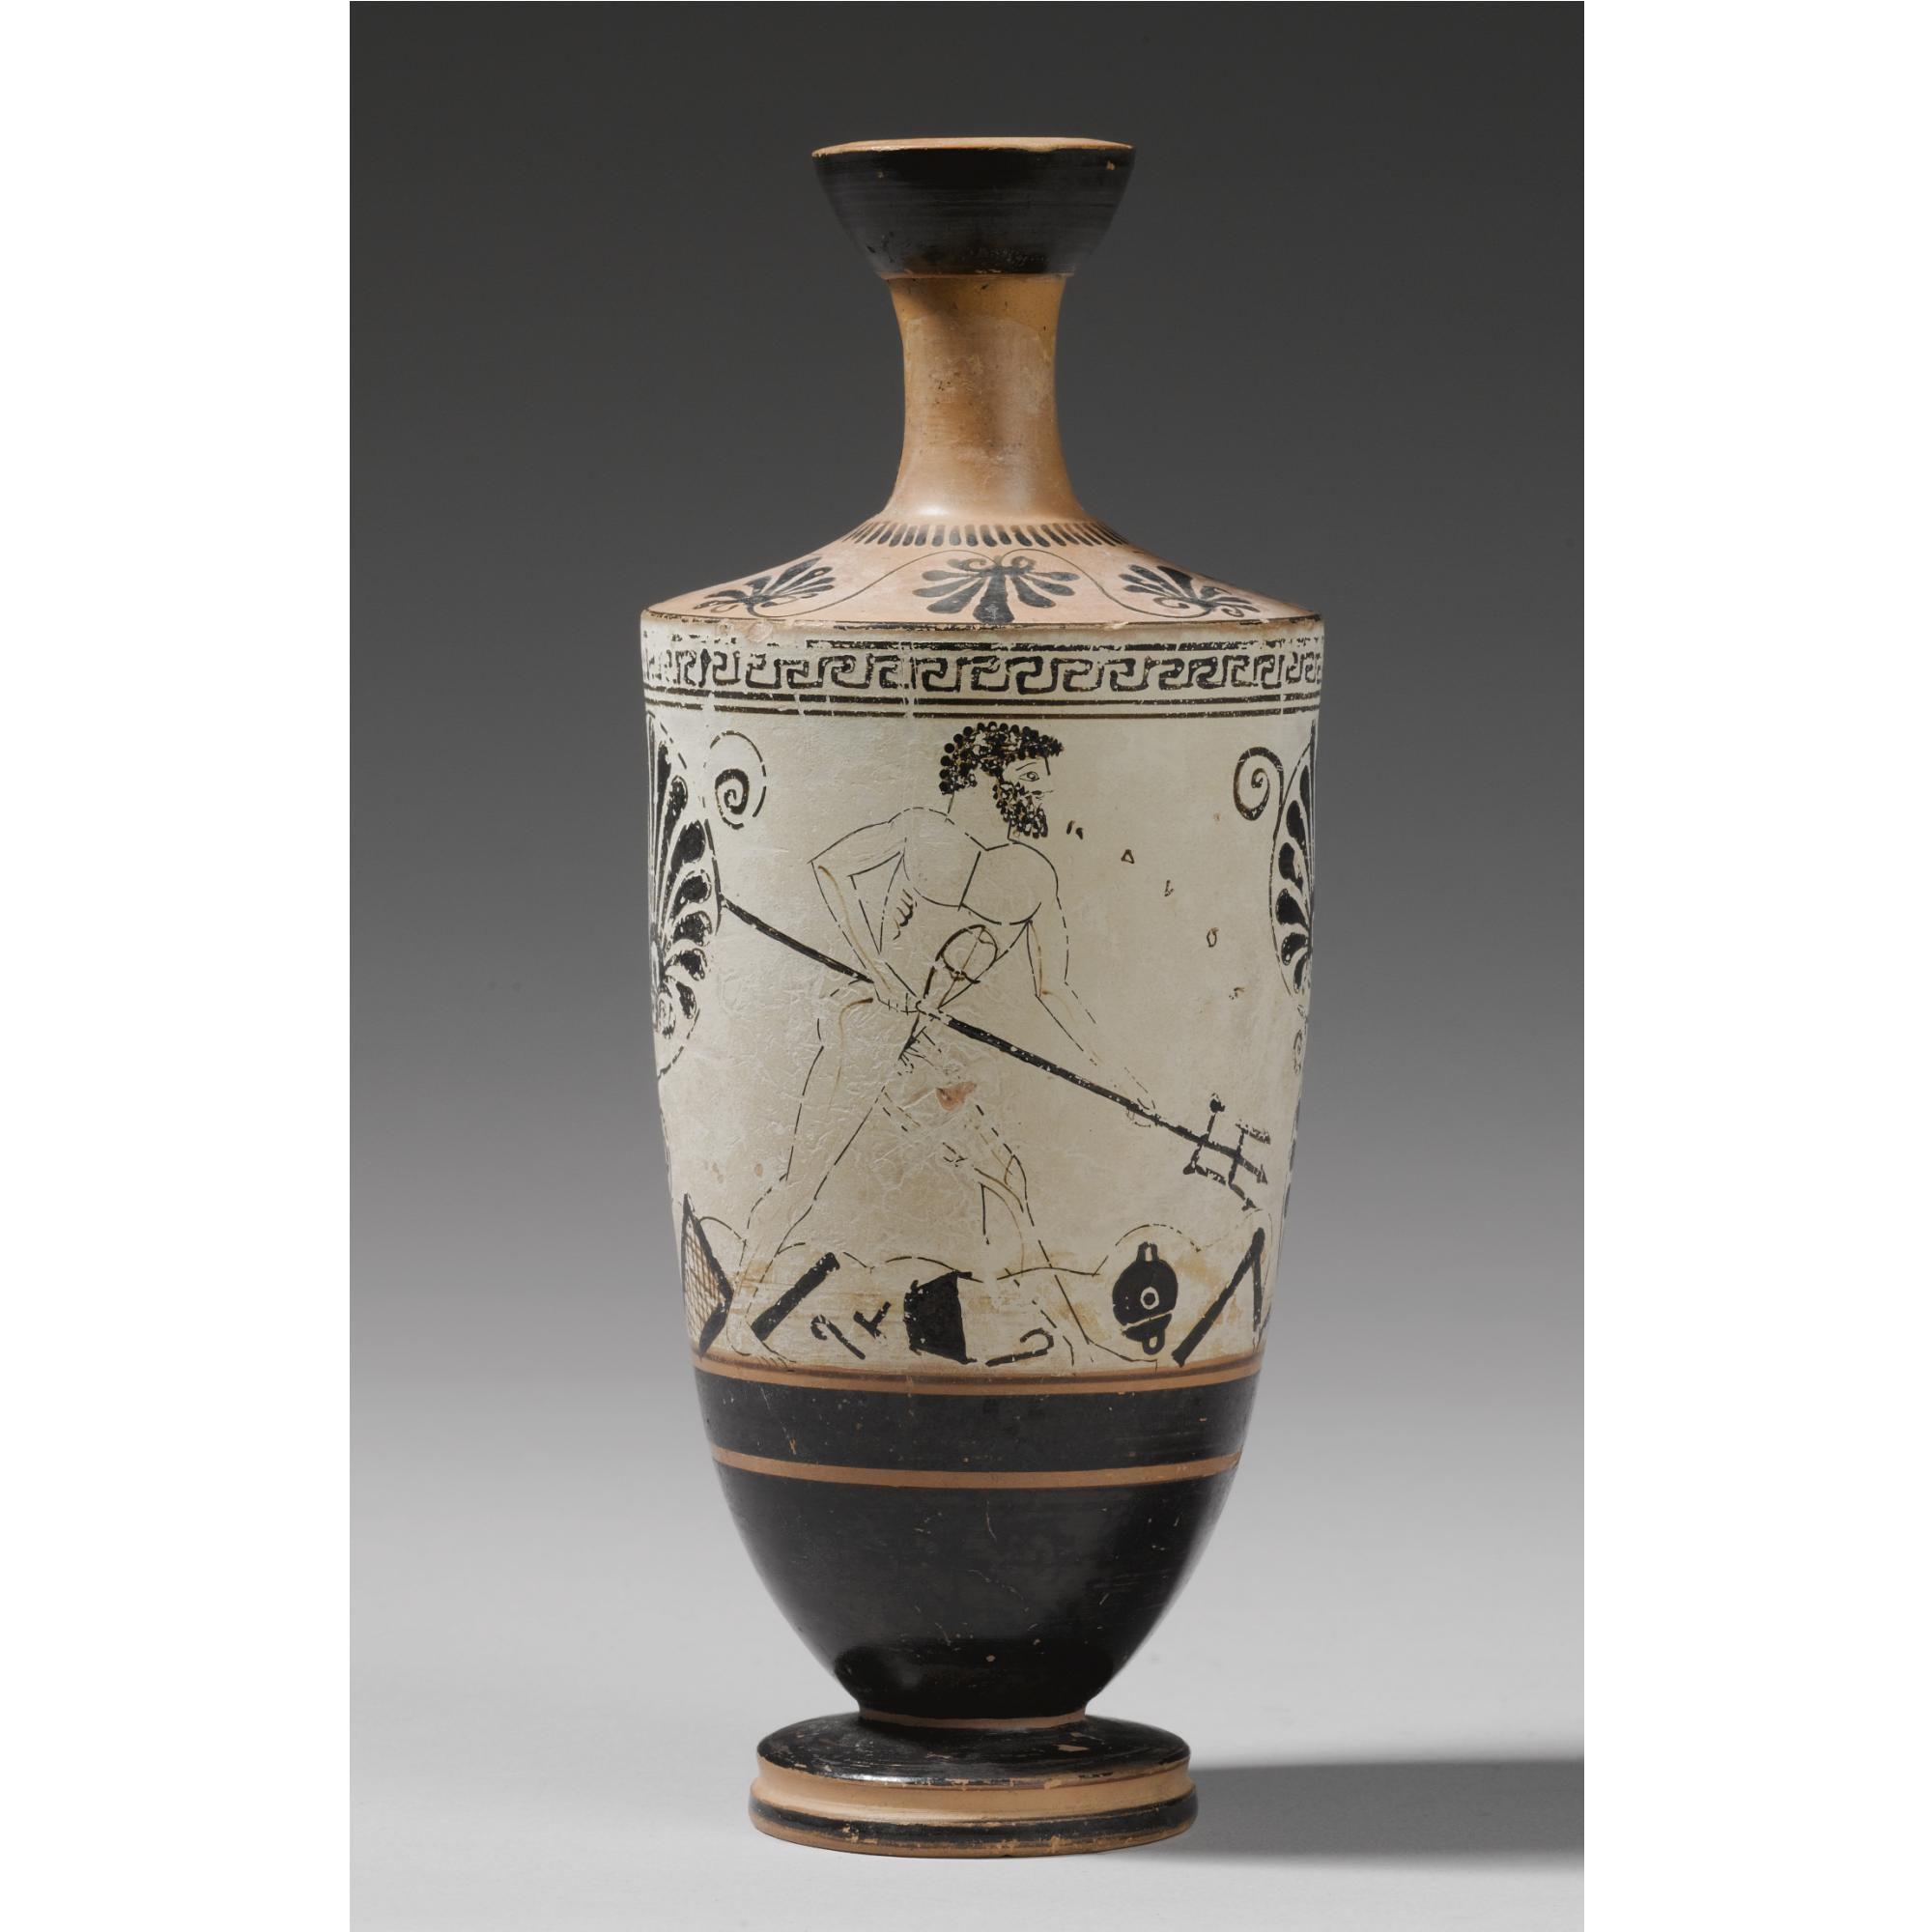 An Attic White Ground Lekythos Circa 490 480 B C Lot Sotheby S Ancient Greek Pottery Ancient Greek Art Greek Art